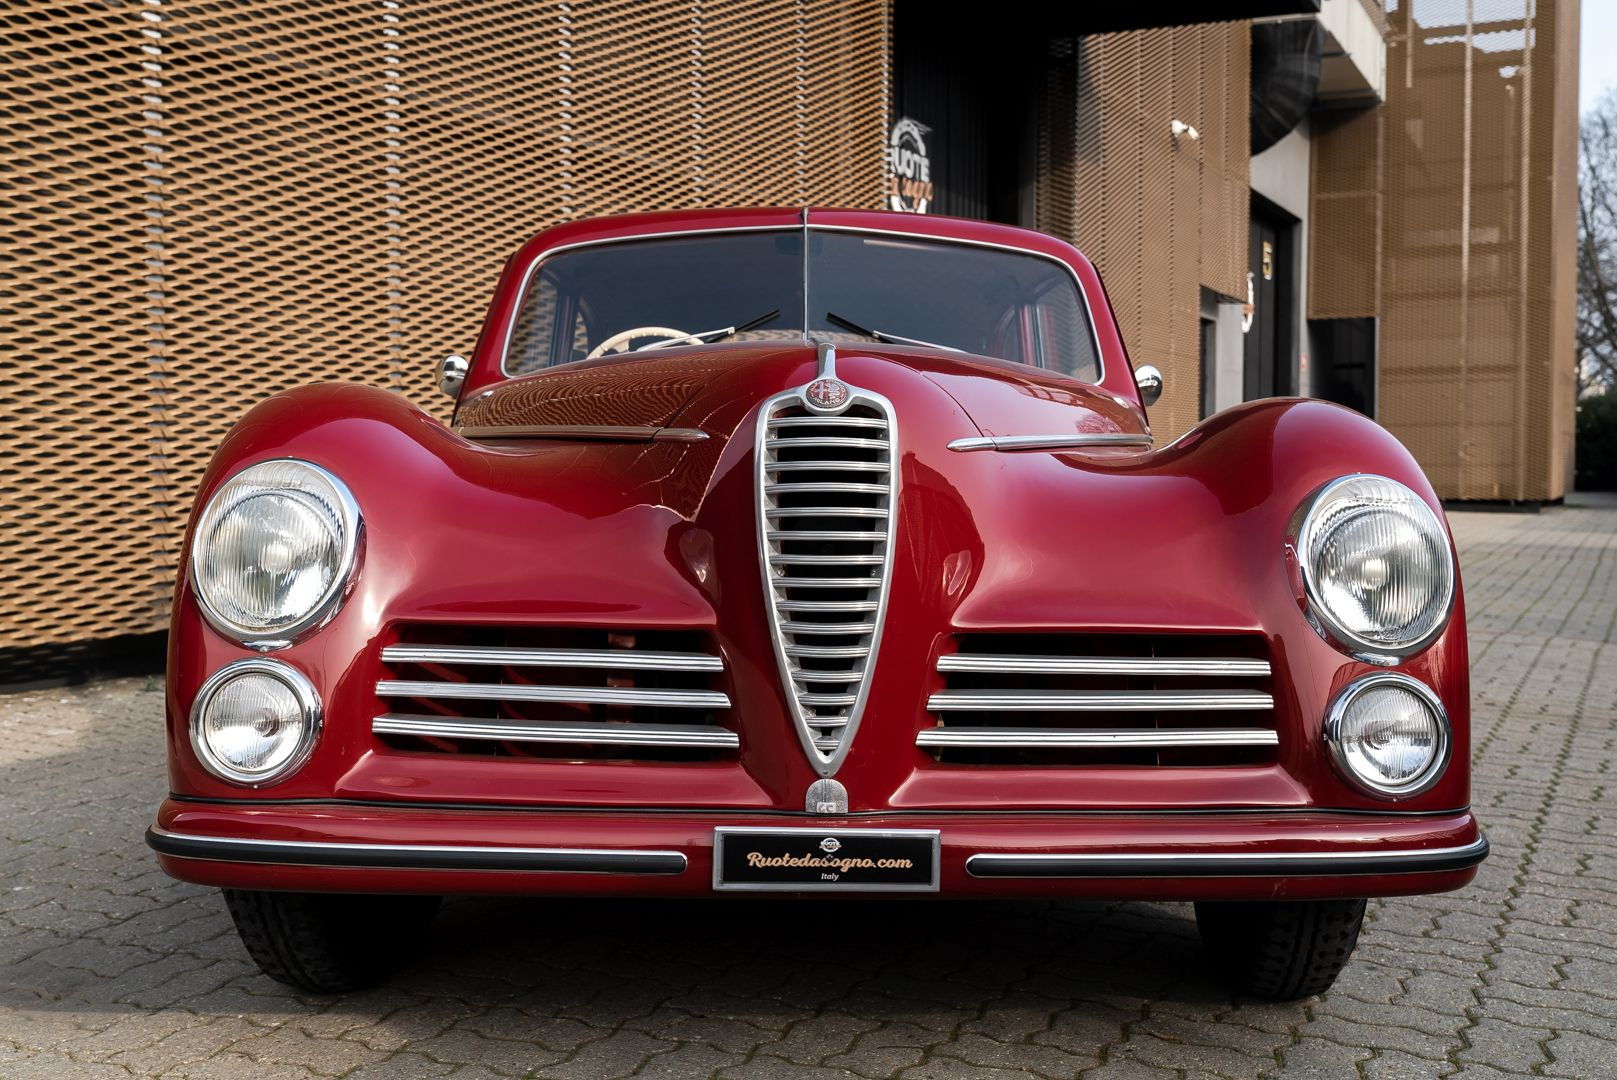 1947 Alfa Romeo Freccia d'oro 6C 2500 Sport 61698